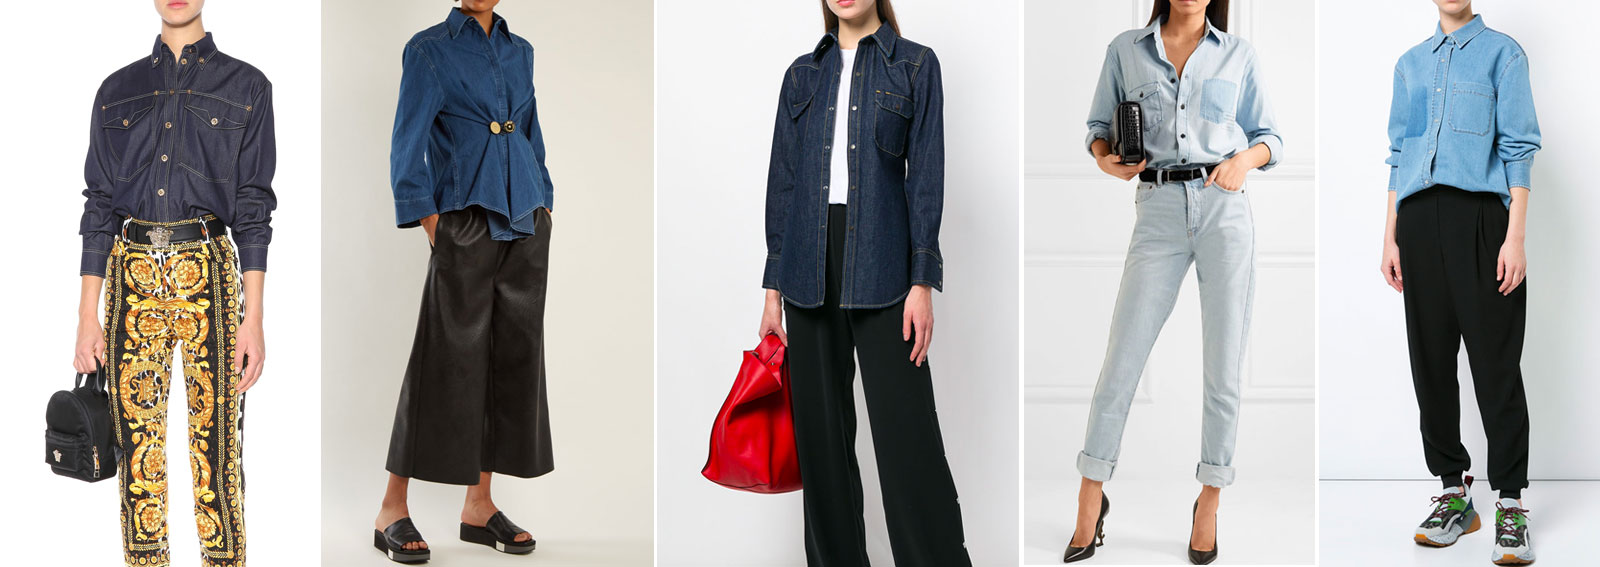 COVER-come-indossare-camicia-jeans-DEKSTOP